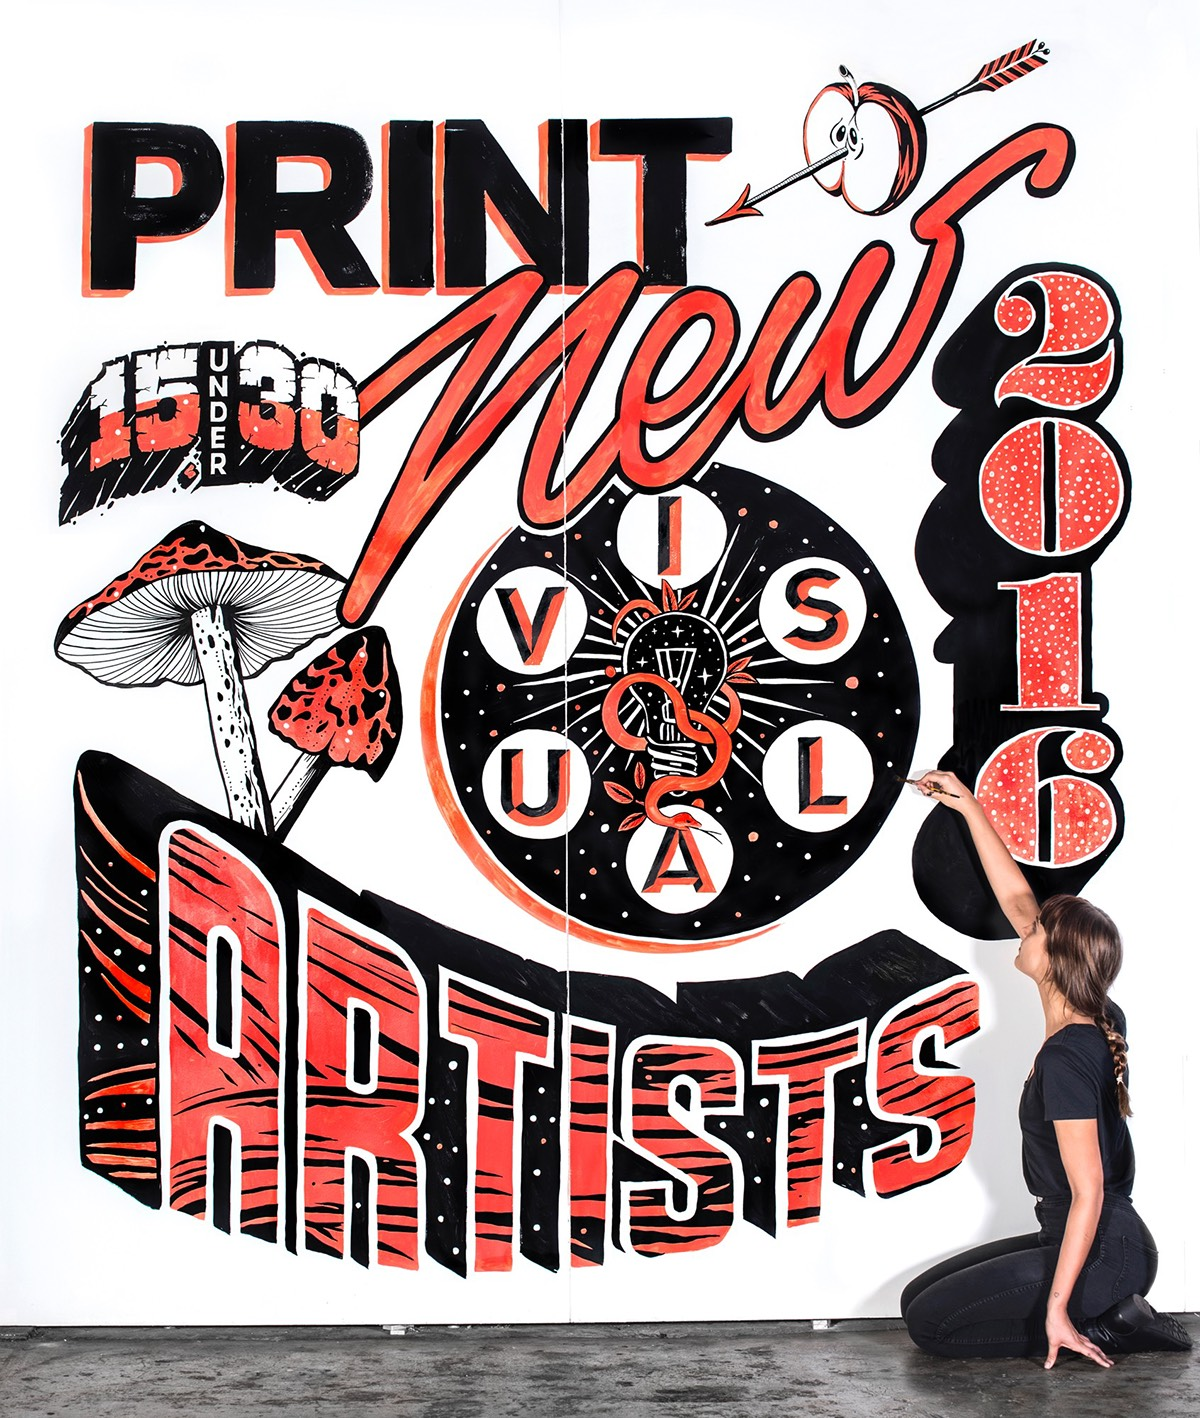 Art by Gemma O'Brien that reads Print New Visuals 15 Under 30 Artists 2016